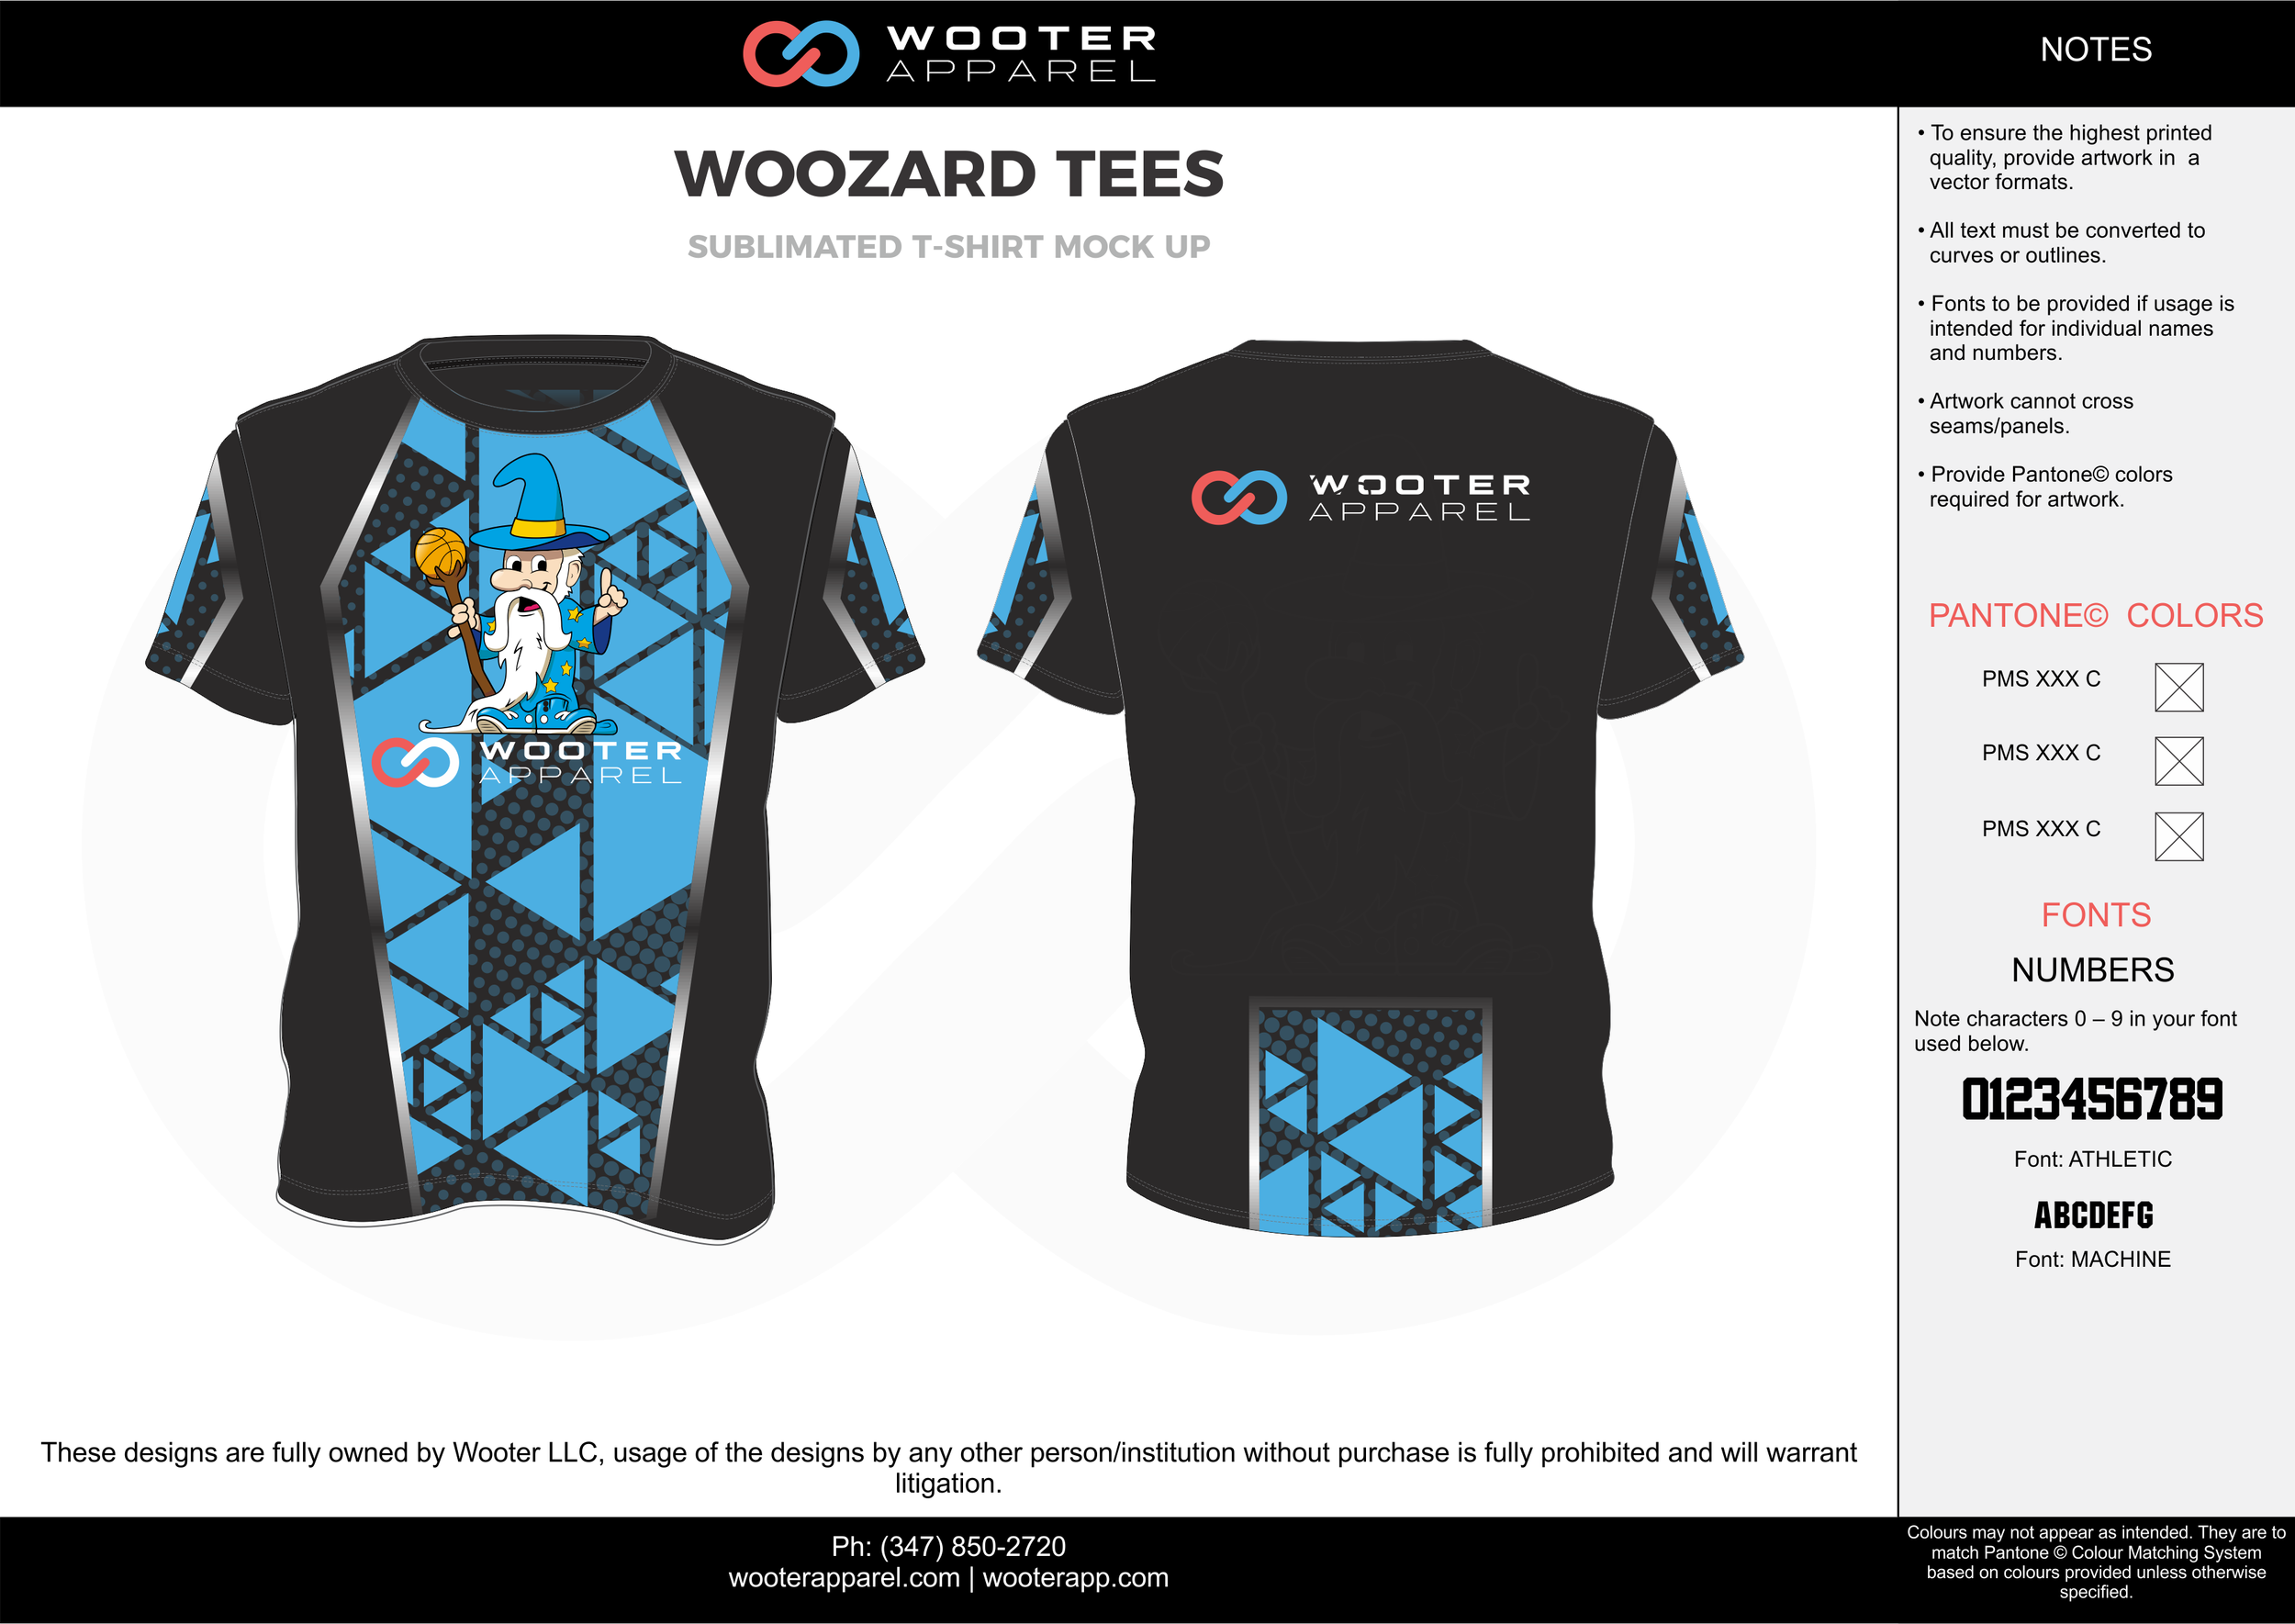 WOOZARD TEES black blue white custom design t-shirts